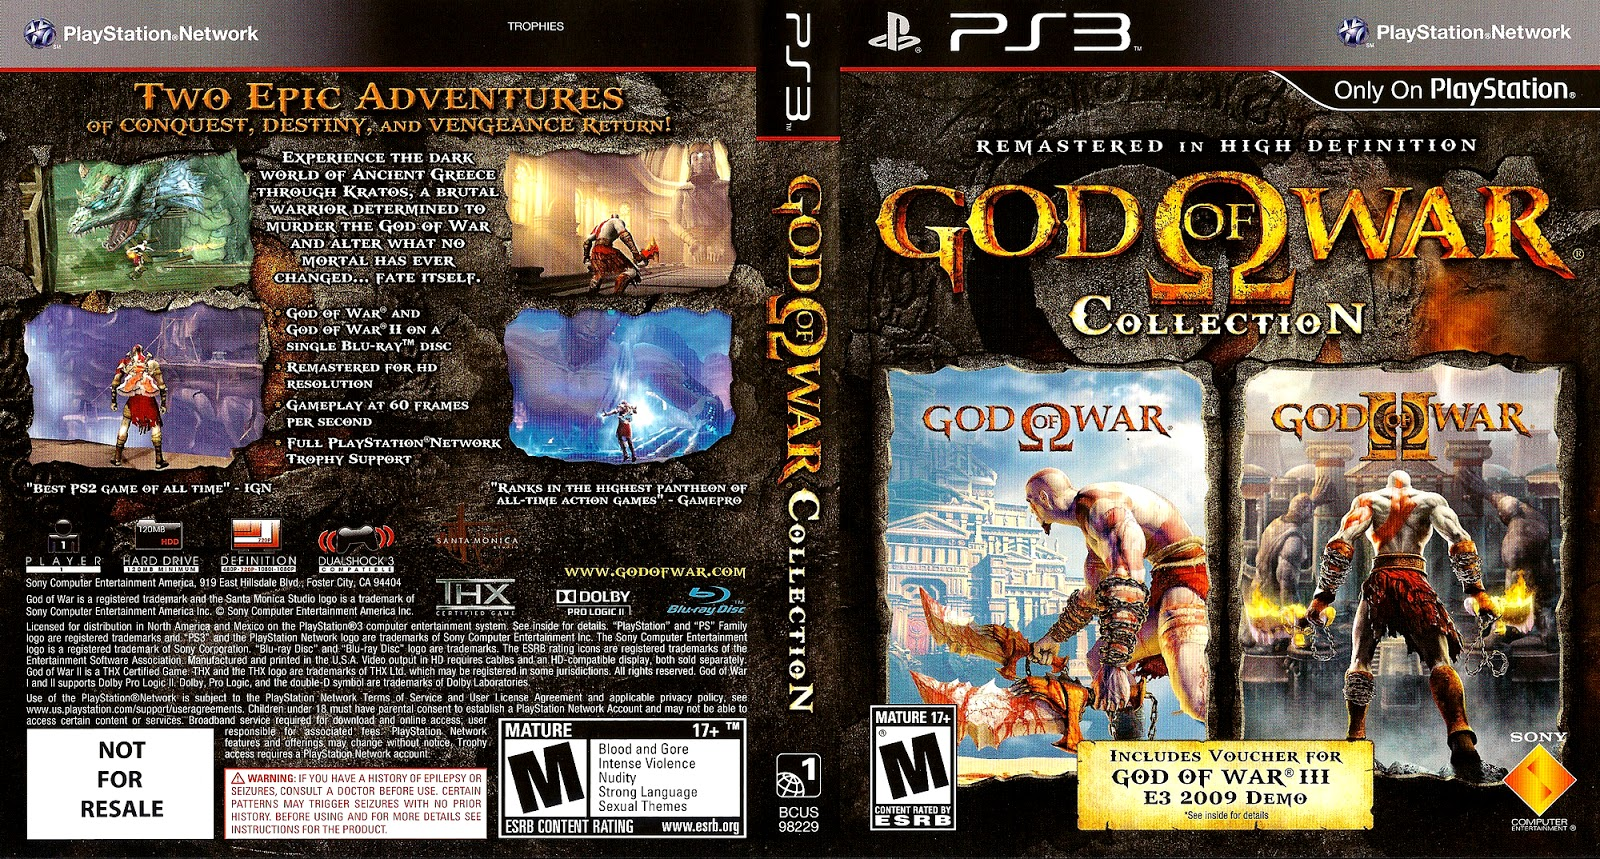 Ps3 god of war collection торрент.